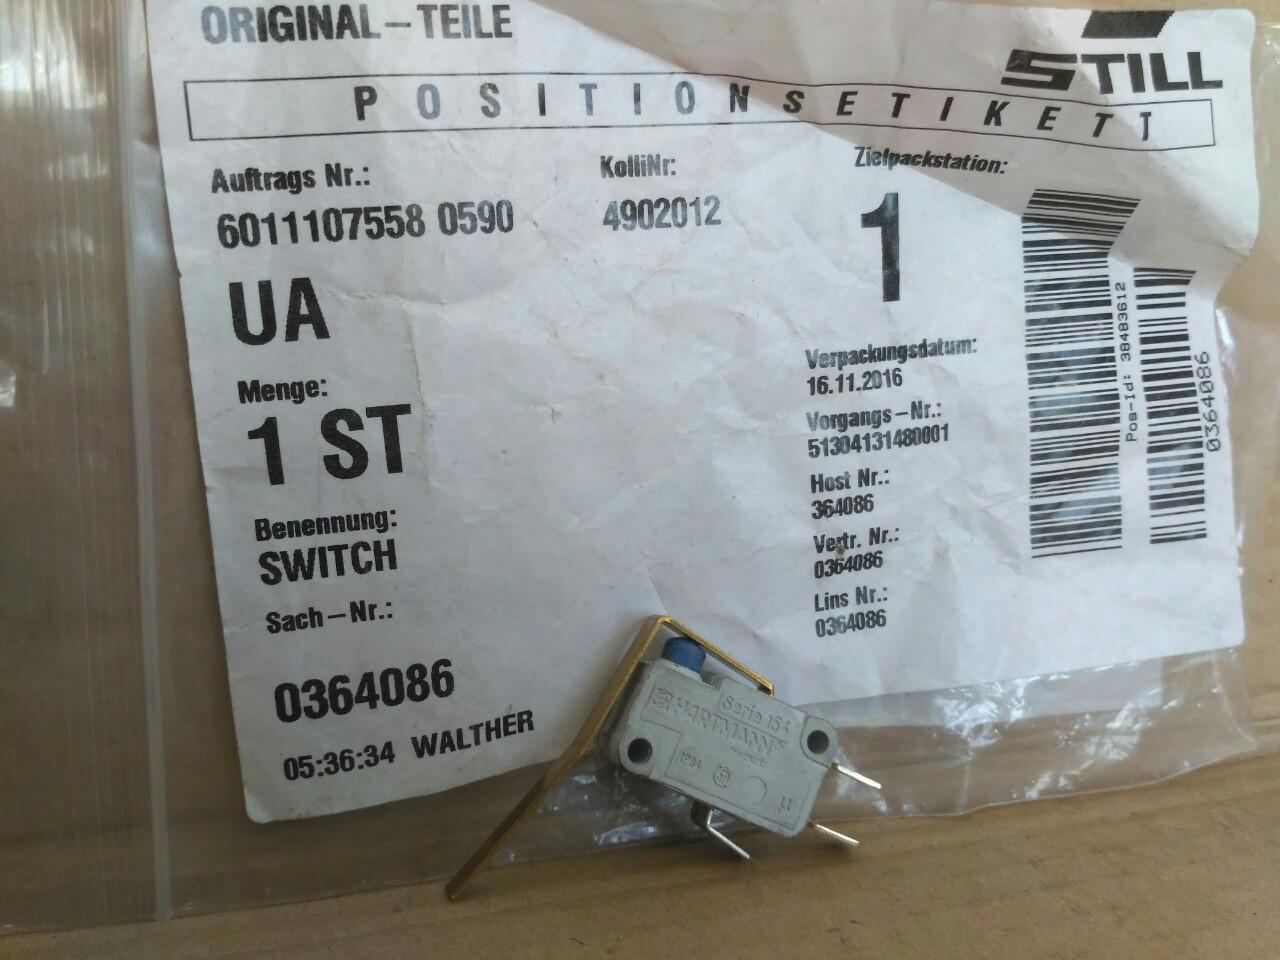 STILL 0364086 датчик стояночного тормоза / датчик стояночного гальма